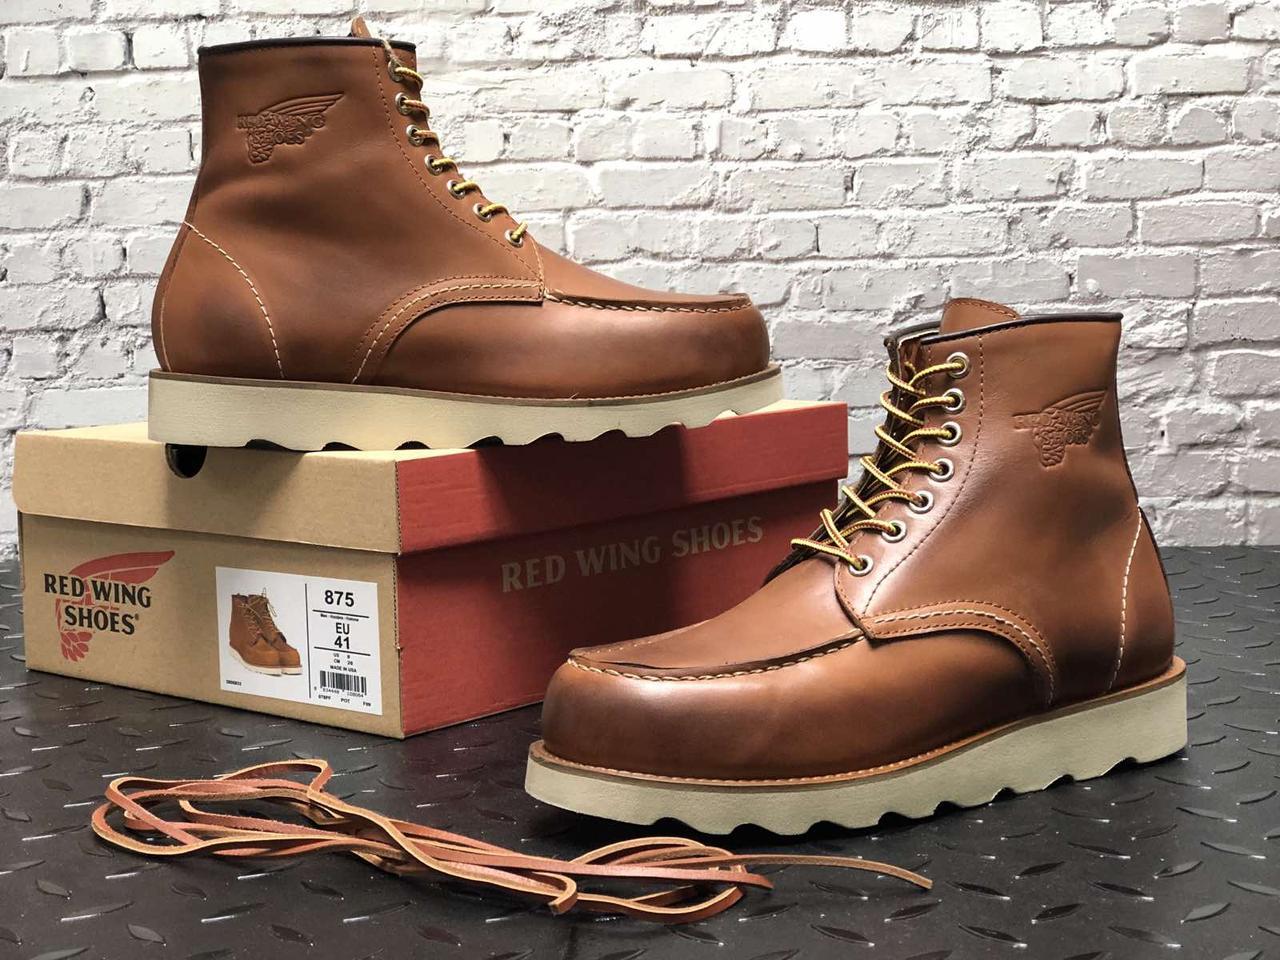 Мужские зимние ботинки Red Wing Shoes с мехом ботинки ред винг зимові черевики Red Wing Classic ботінки зимові